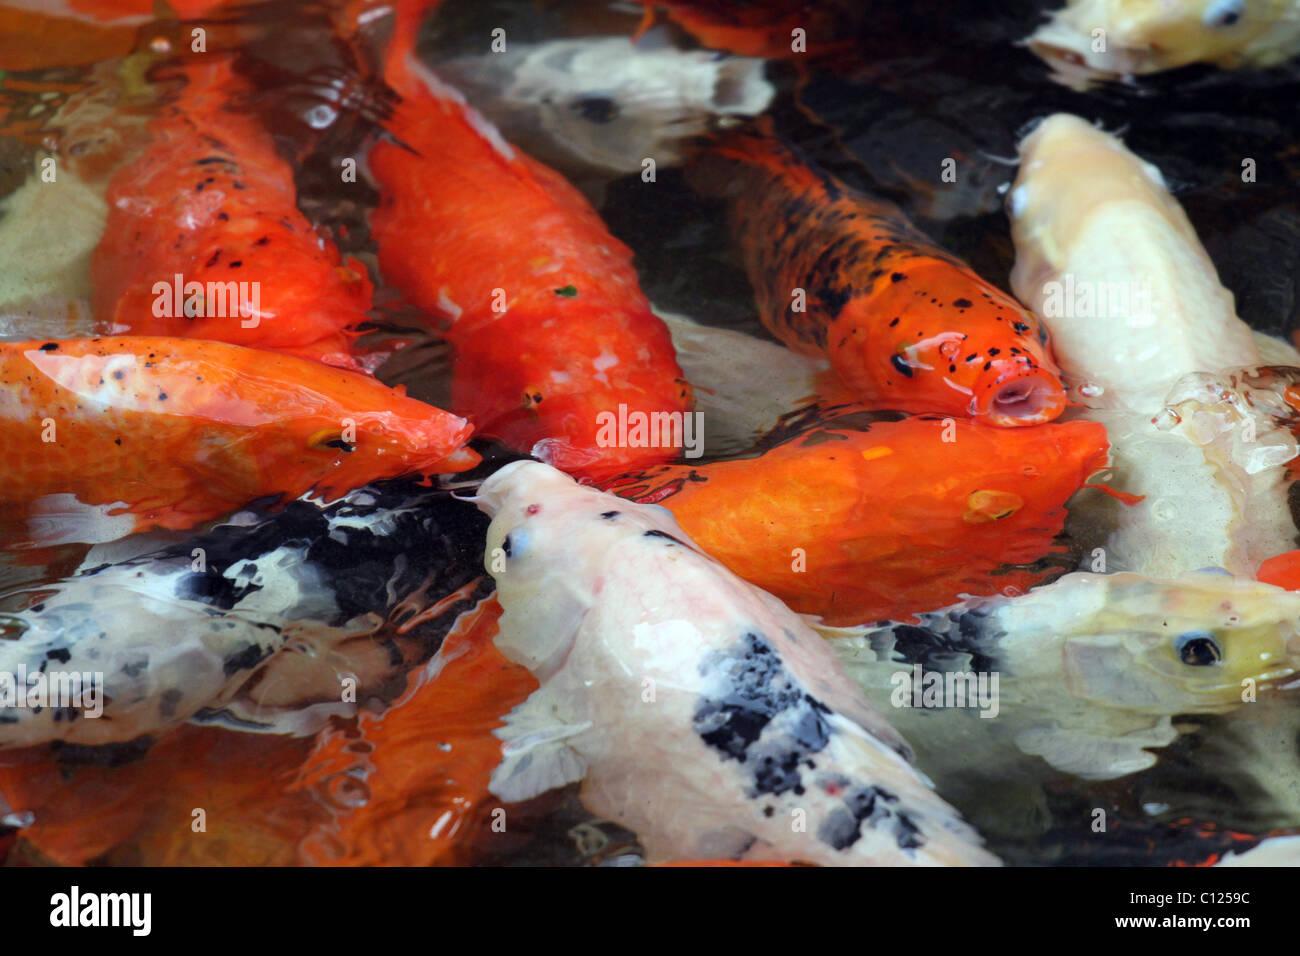 Koi Carp and goldfish fish swimming in a pool in Macau, China Stock Photo